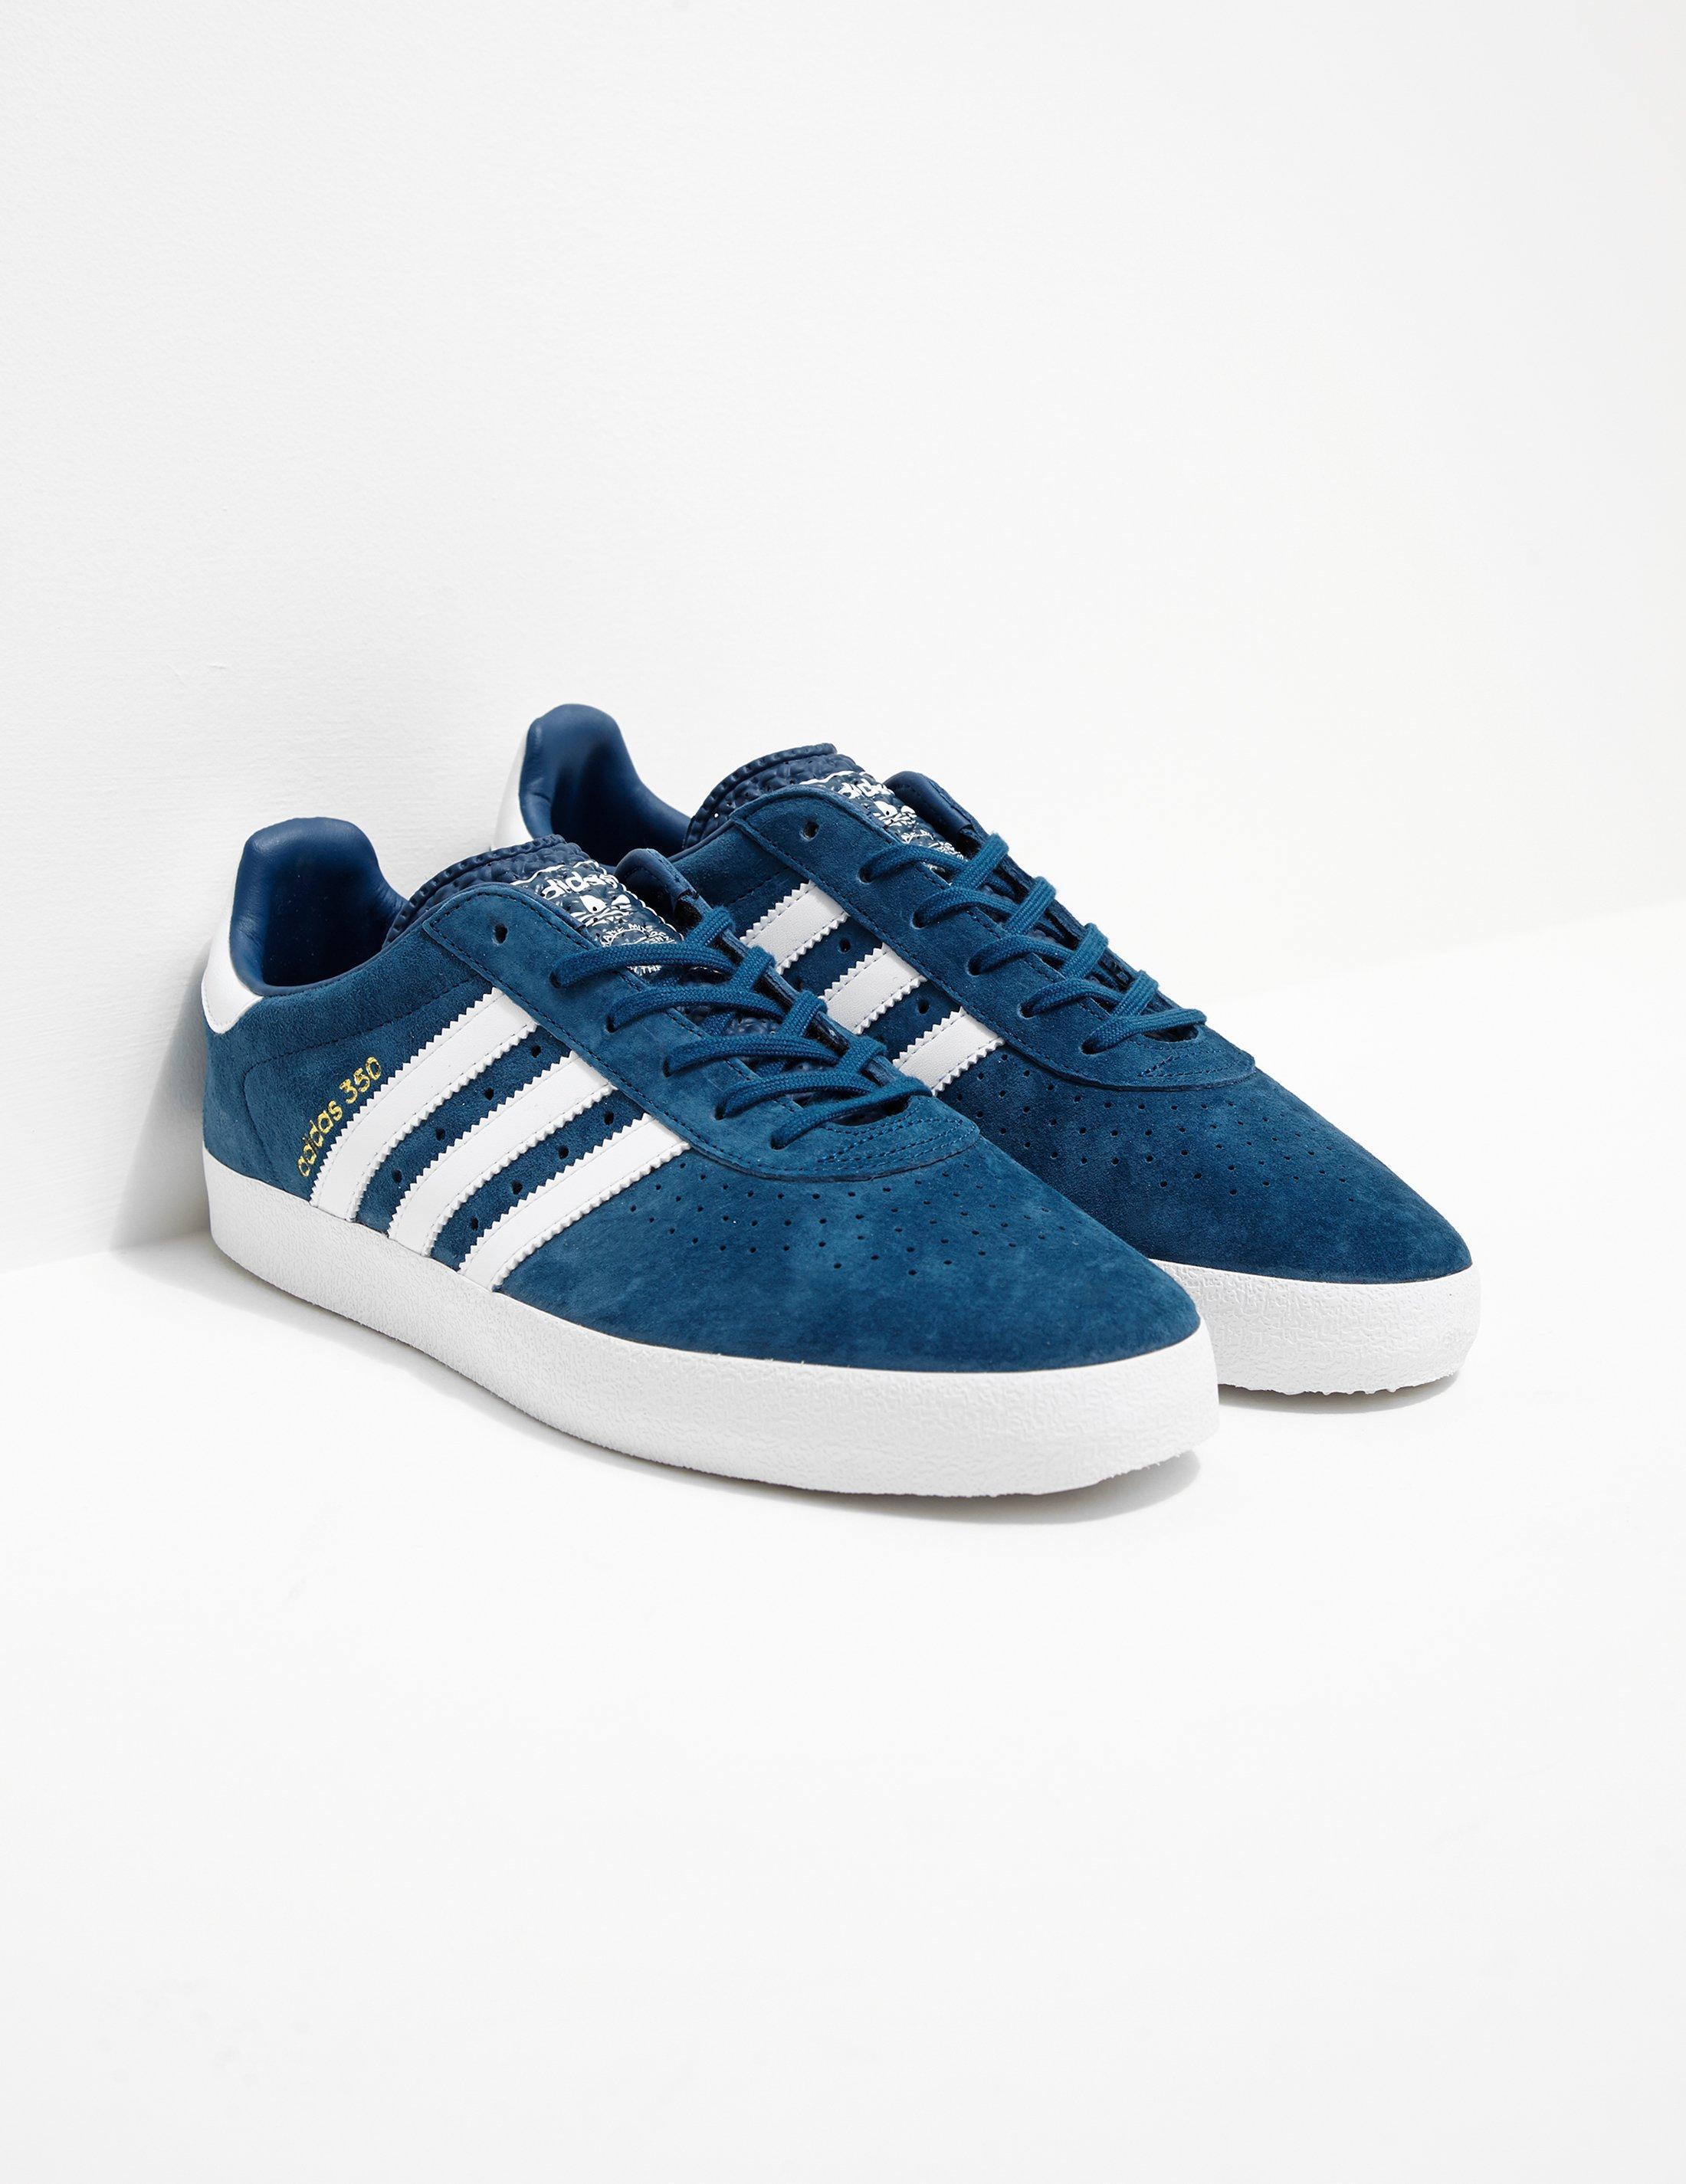 adidas Originals Mens 350 Suede Blue/white for Men - Lyst